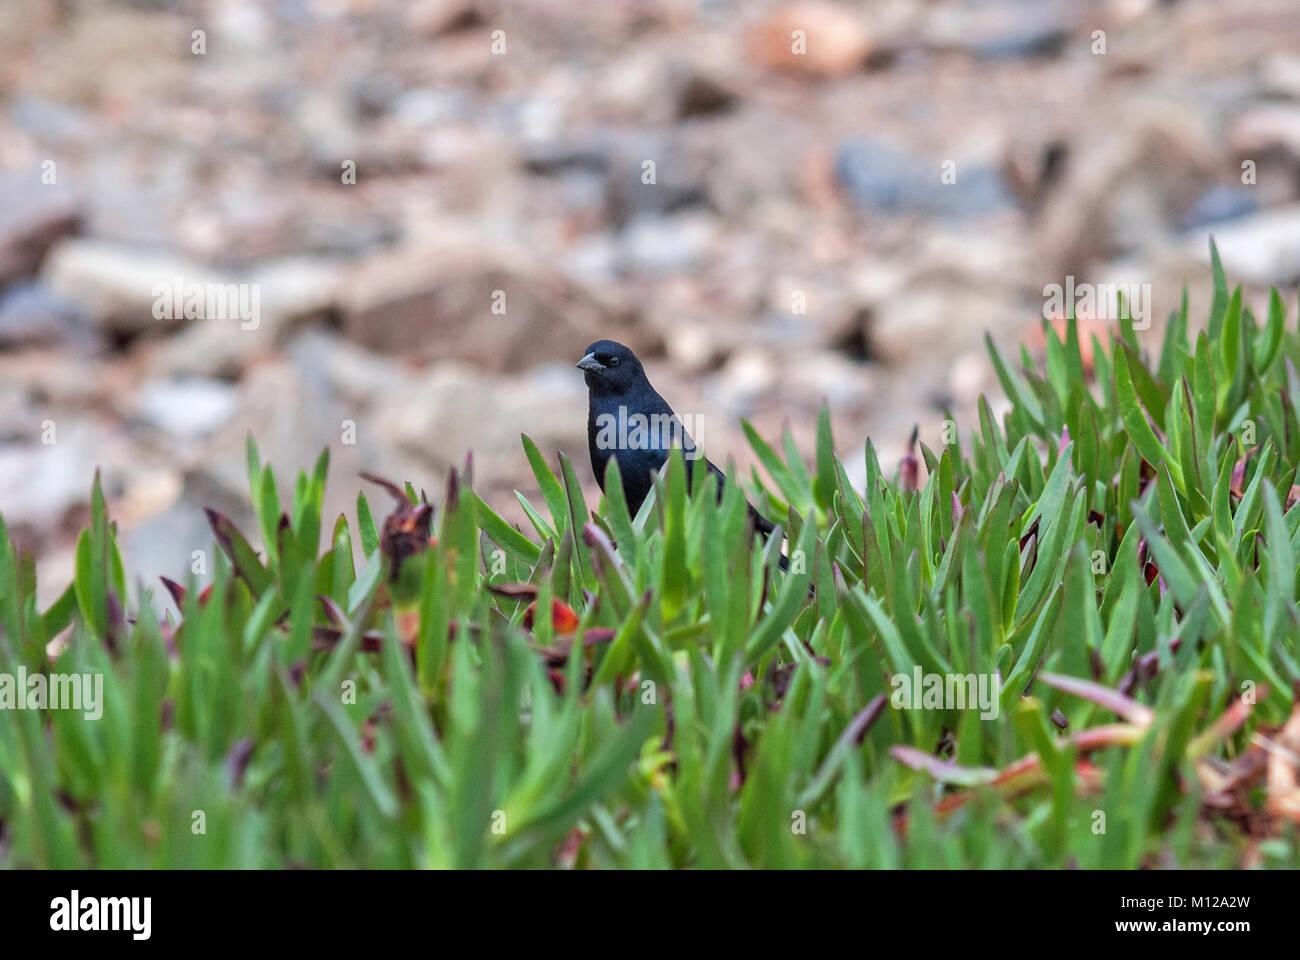 Black bird behind the green grass standing still. Punta del Este. Stock Photo